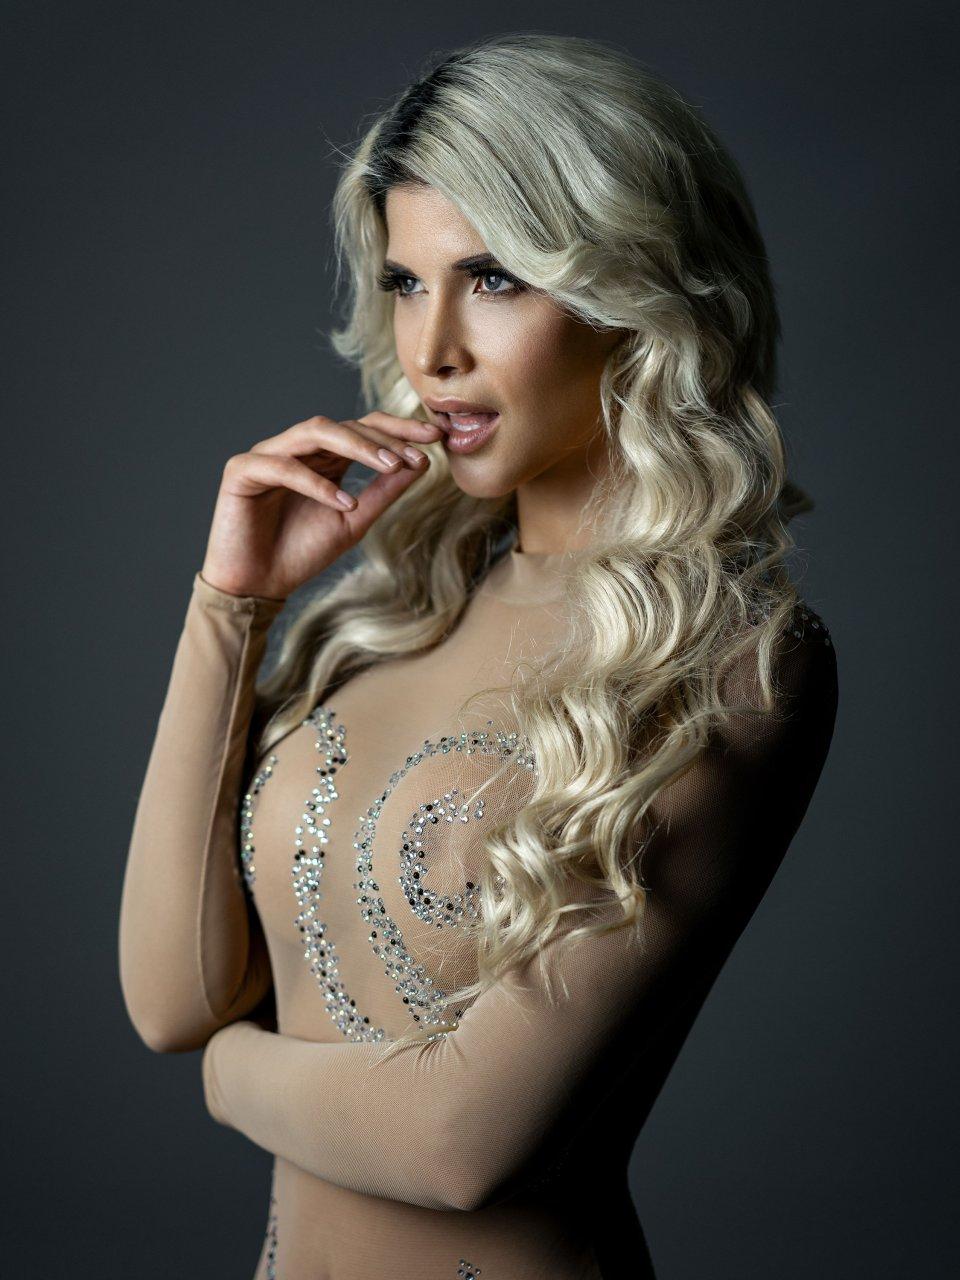 photo Nude photos of Gwen Garcia from Hombre Magazine. Gwen Garcia is a model. Instagram: Twitter